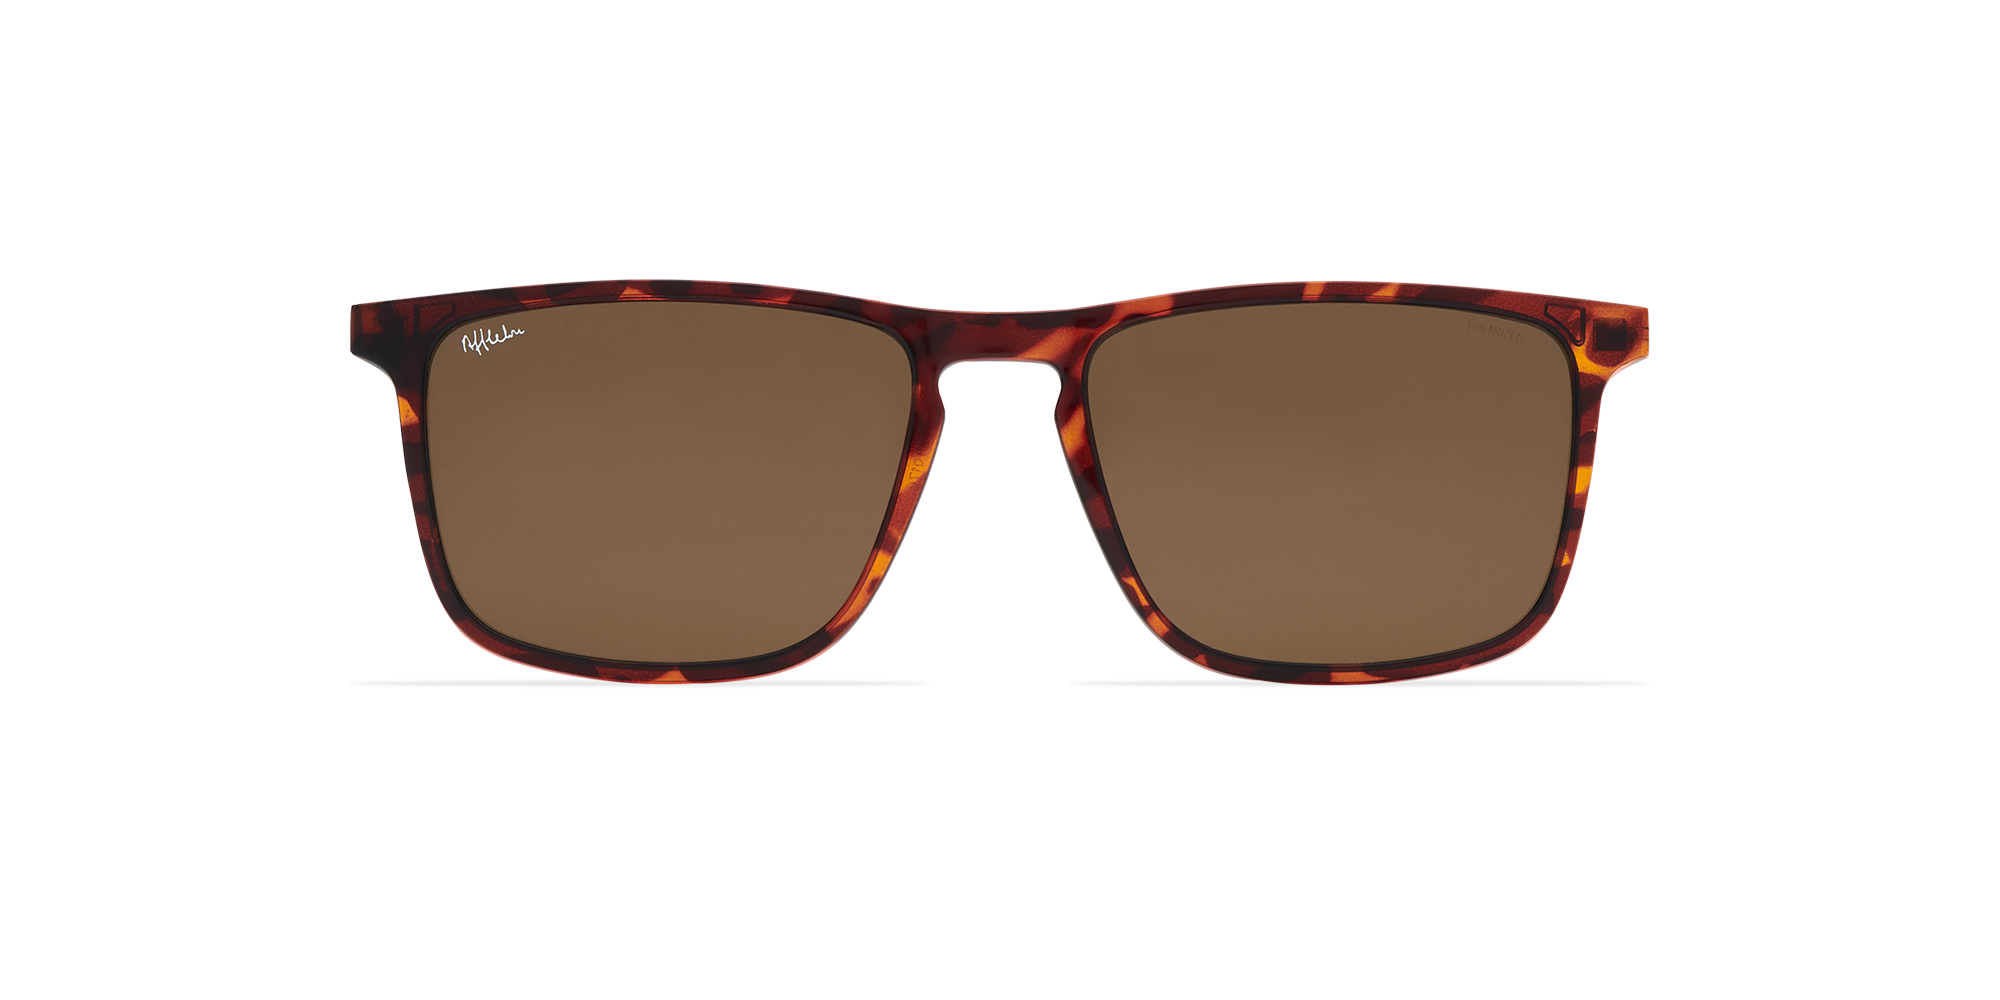 afflelou/france/products/smart_clip/clips_glasses/07630036428764_face.png